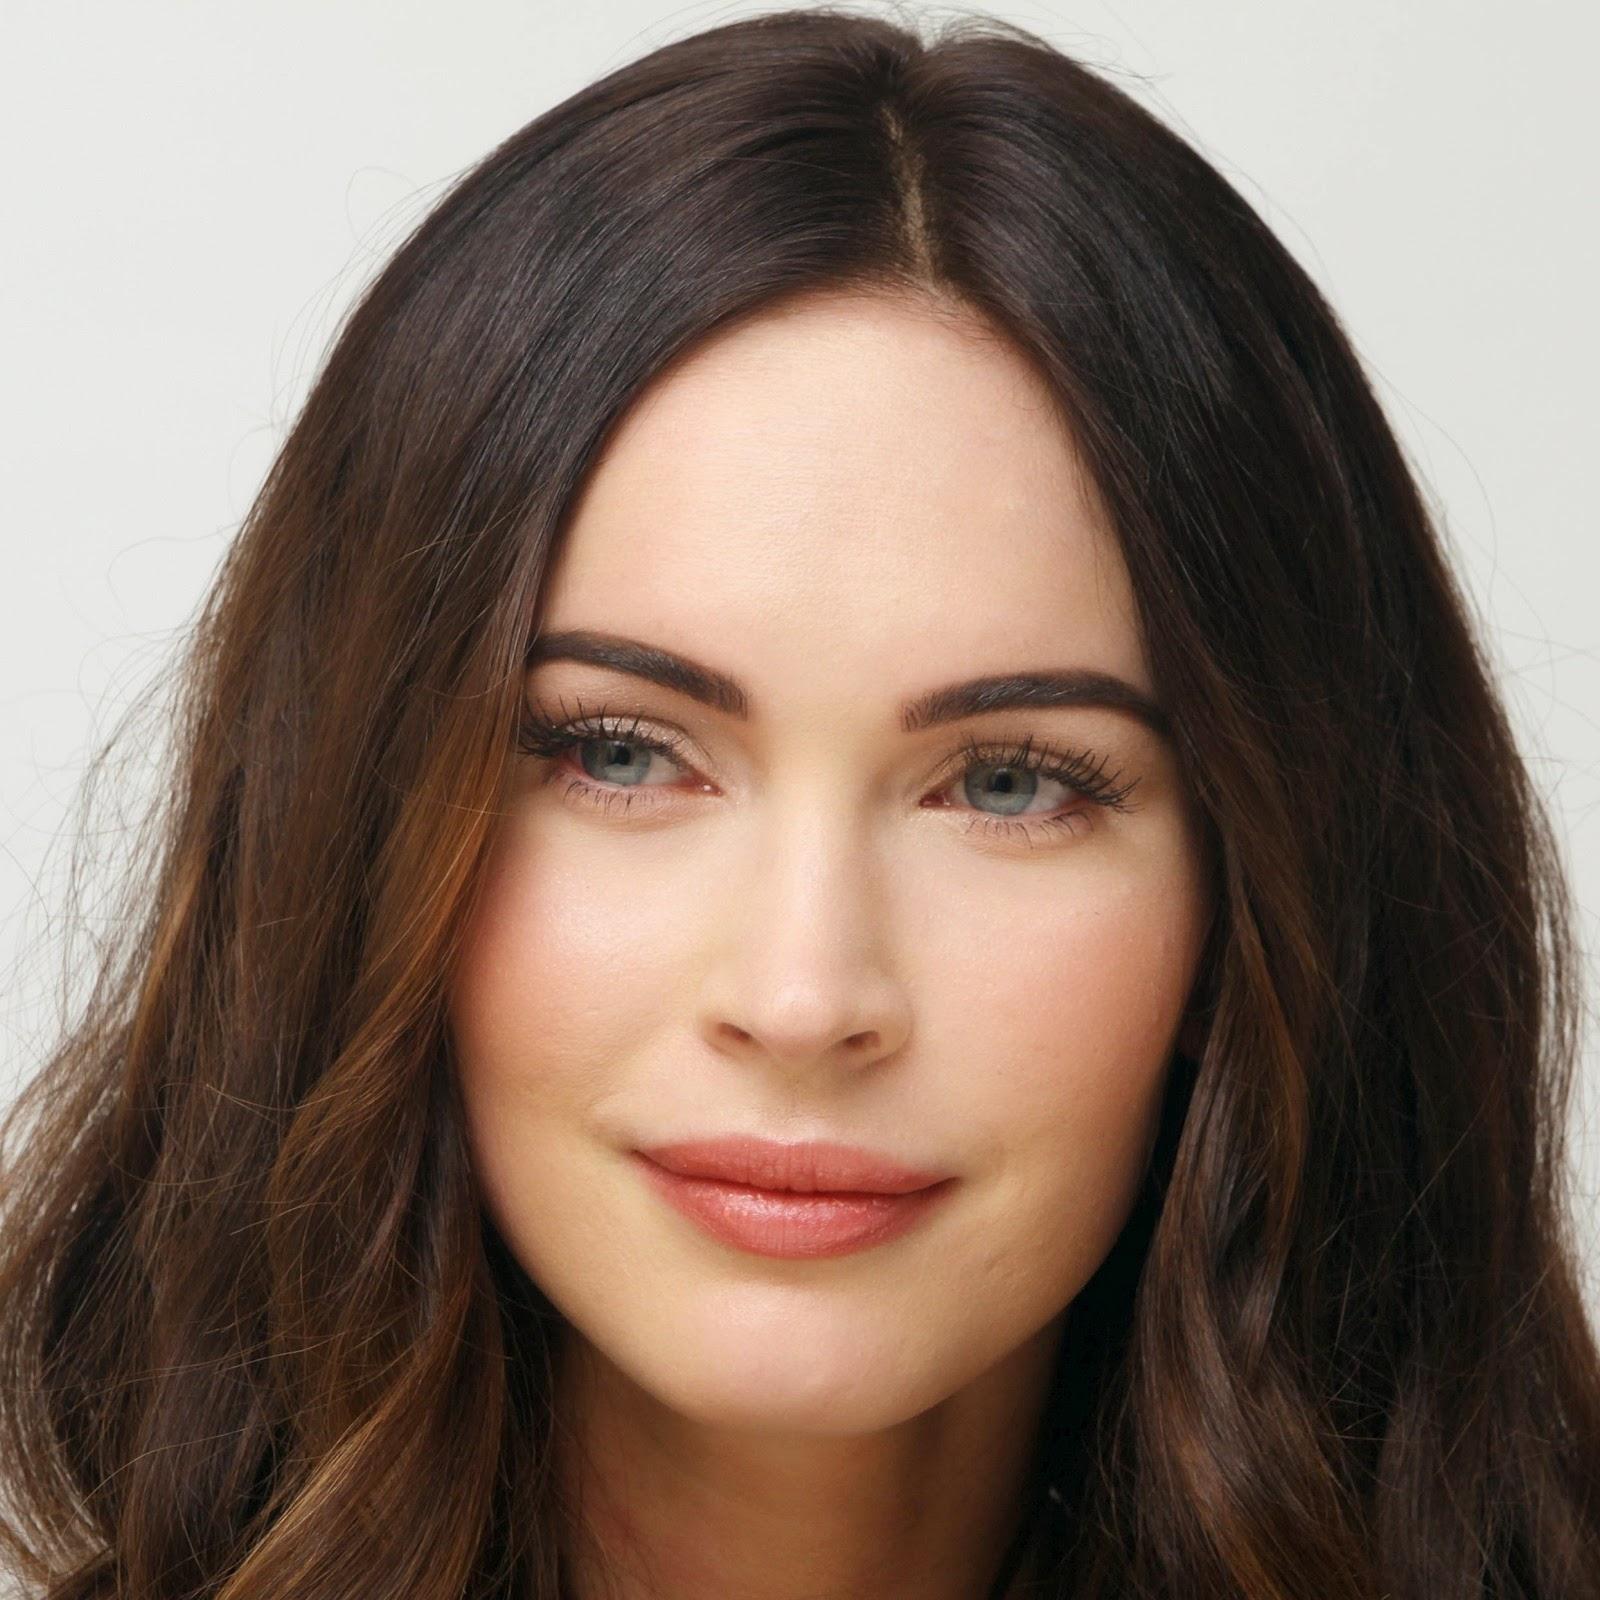 Megan Fox: Women Hair Styles Collection